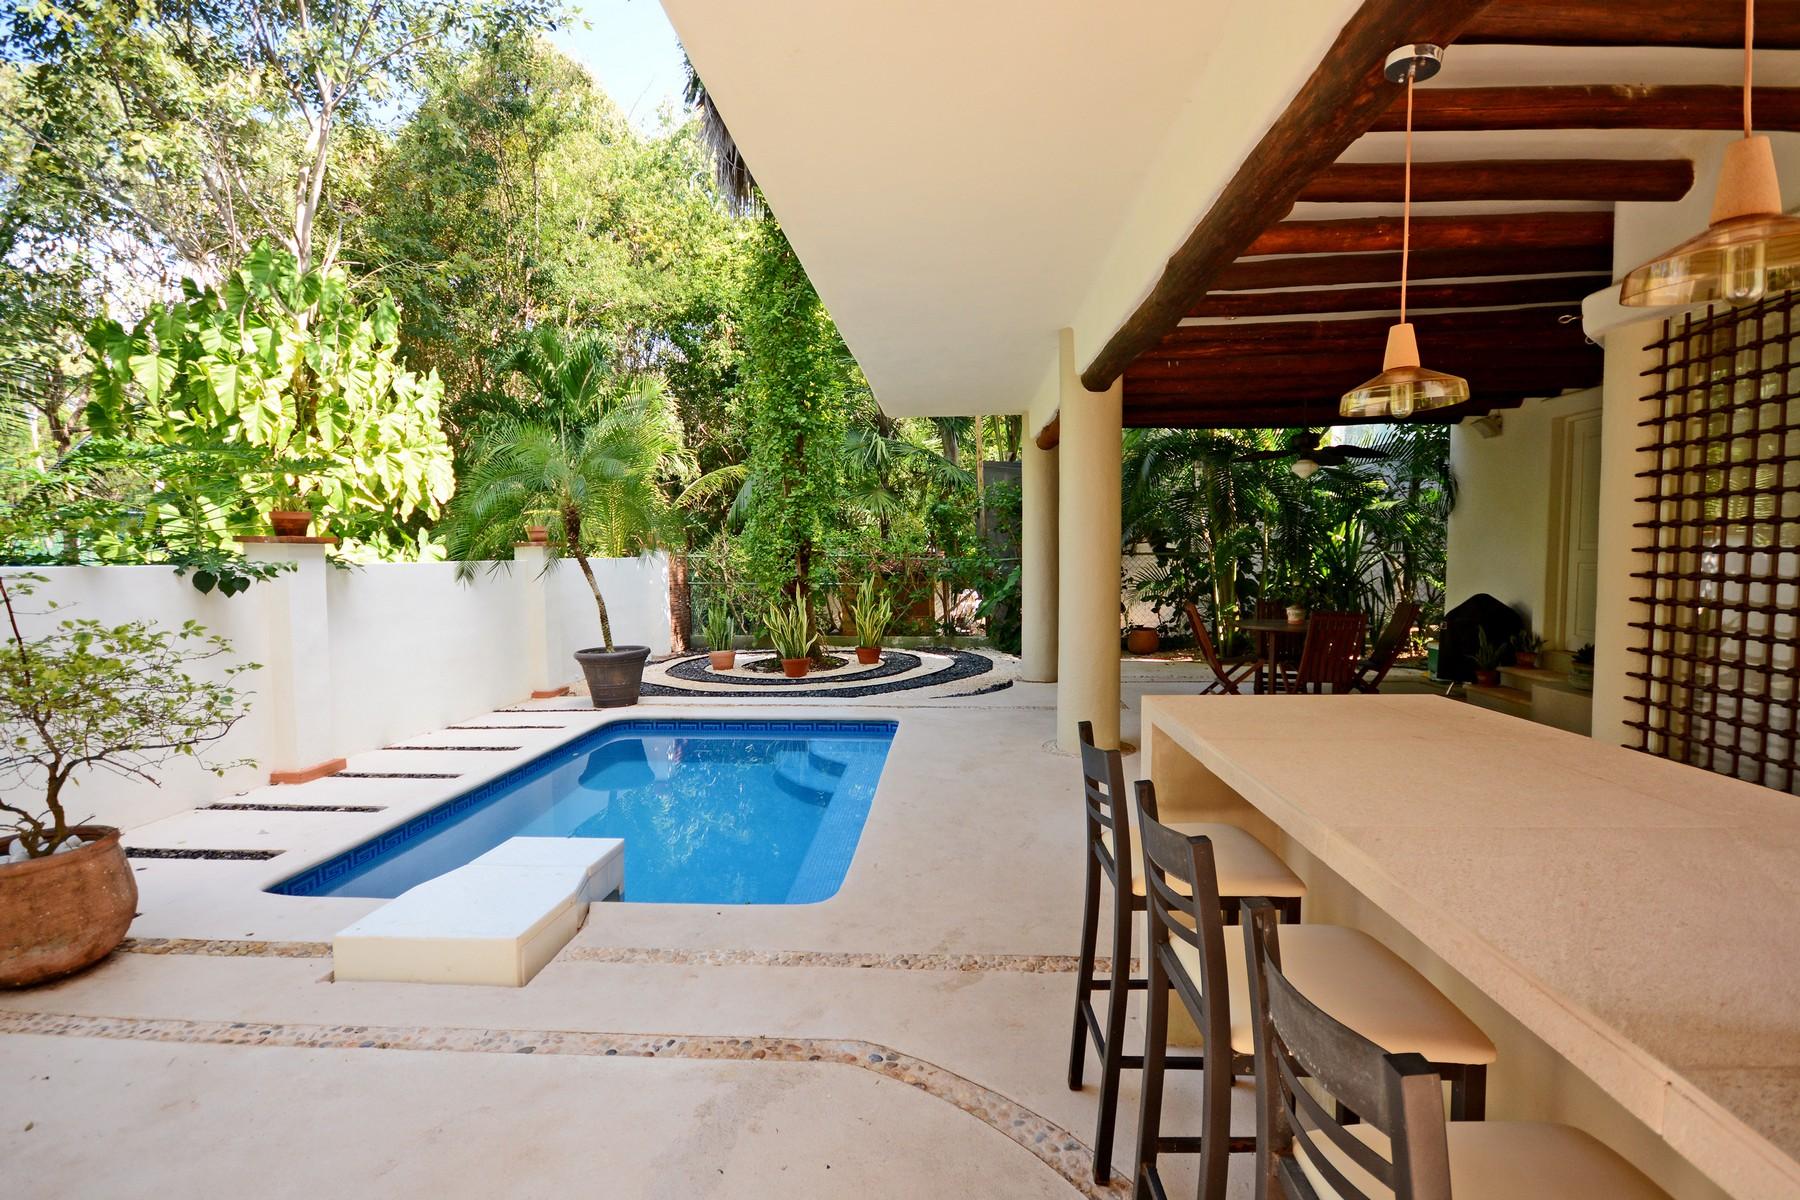 Single Family Home for Sale at SERENITY HOME Retorno Copán Condominio Club Real Mza 22, C 73 Playa Del Carmen, Quintana Roo, 777 Mexico